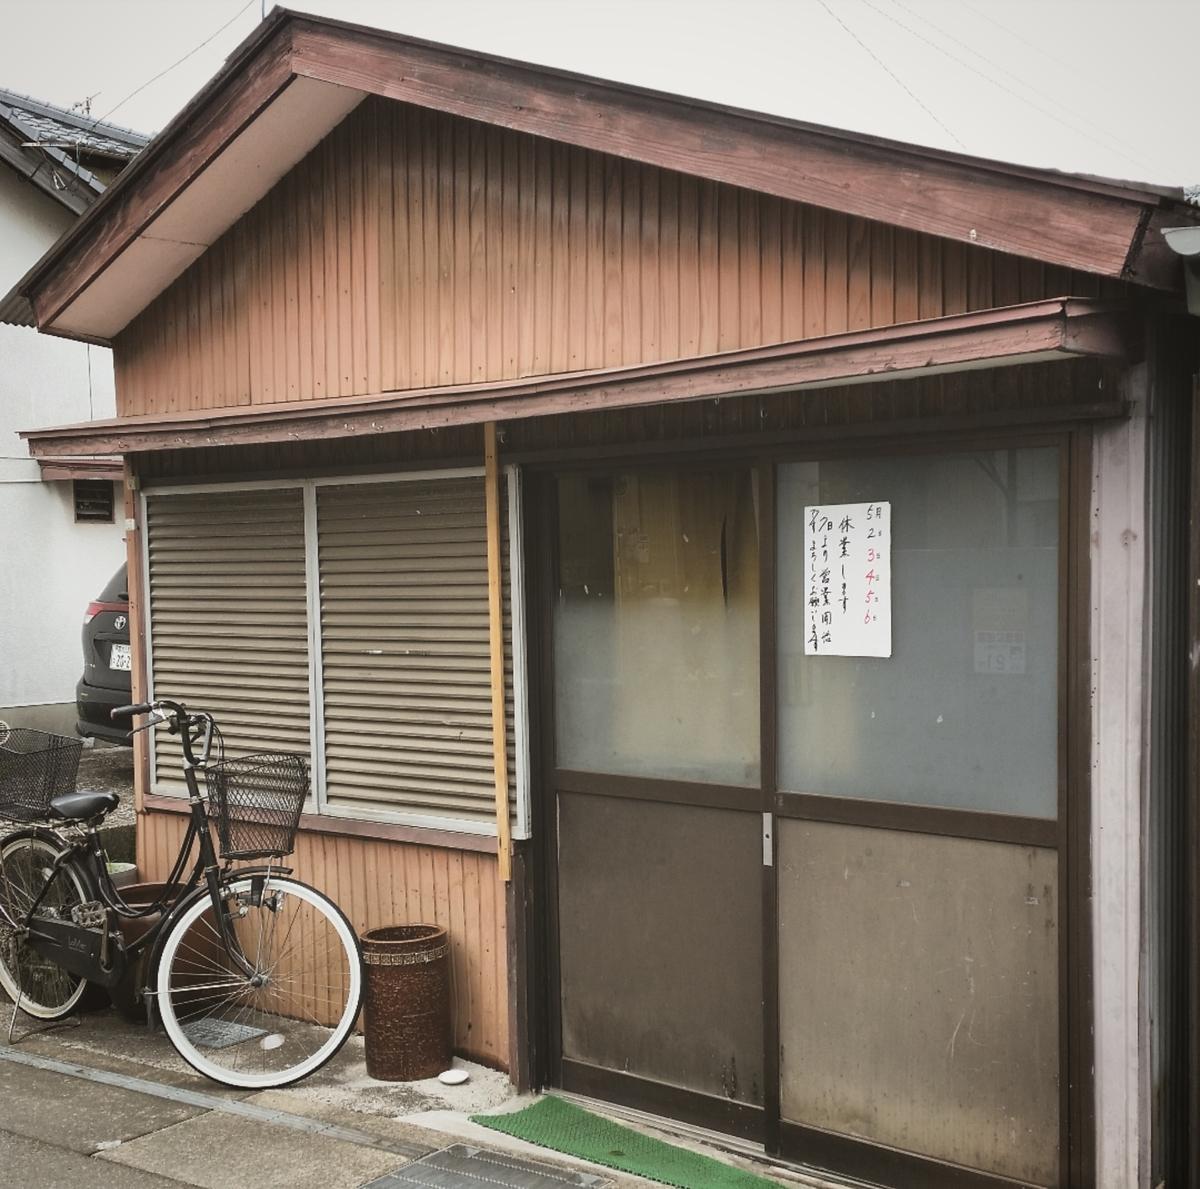 f:id:ichigo-ichie411211:20190507063813j:plain